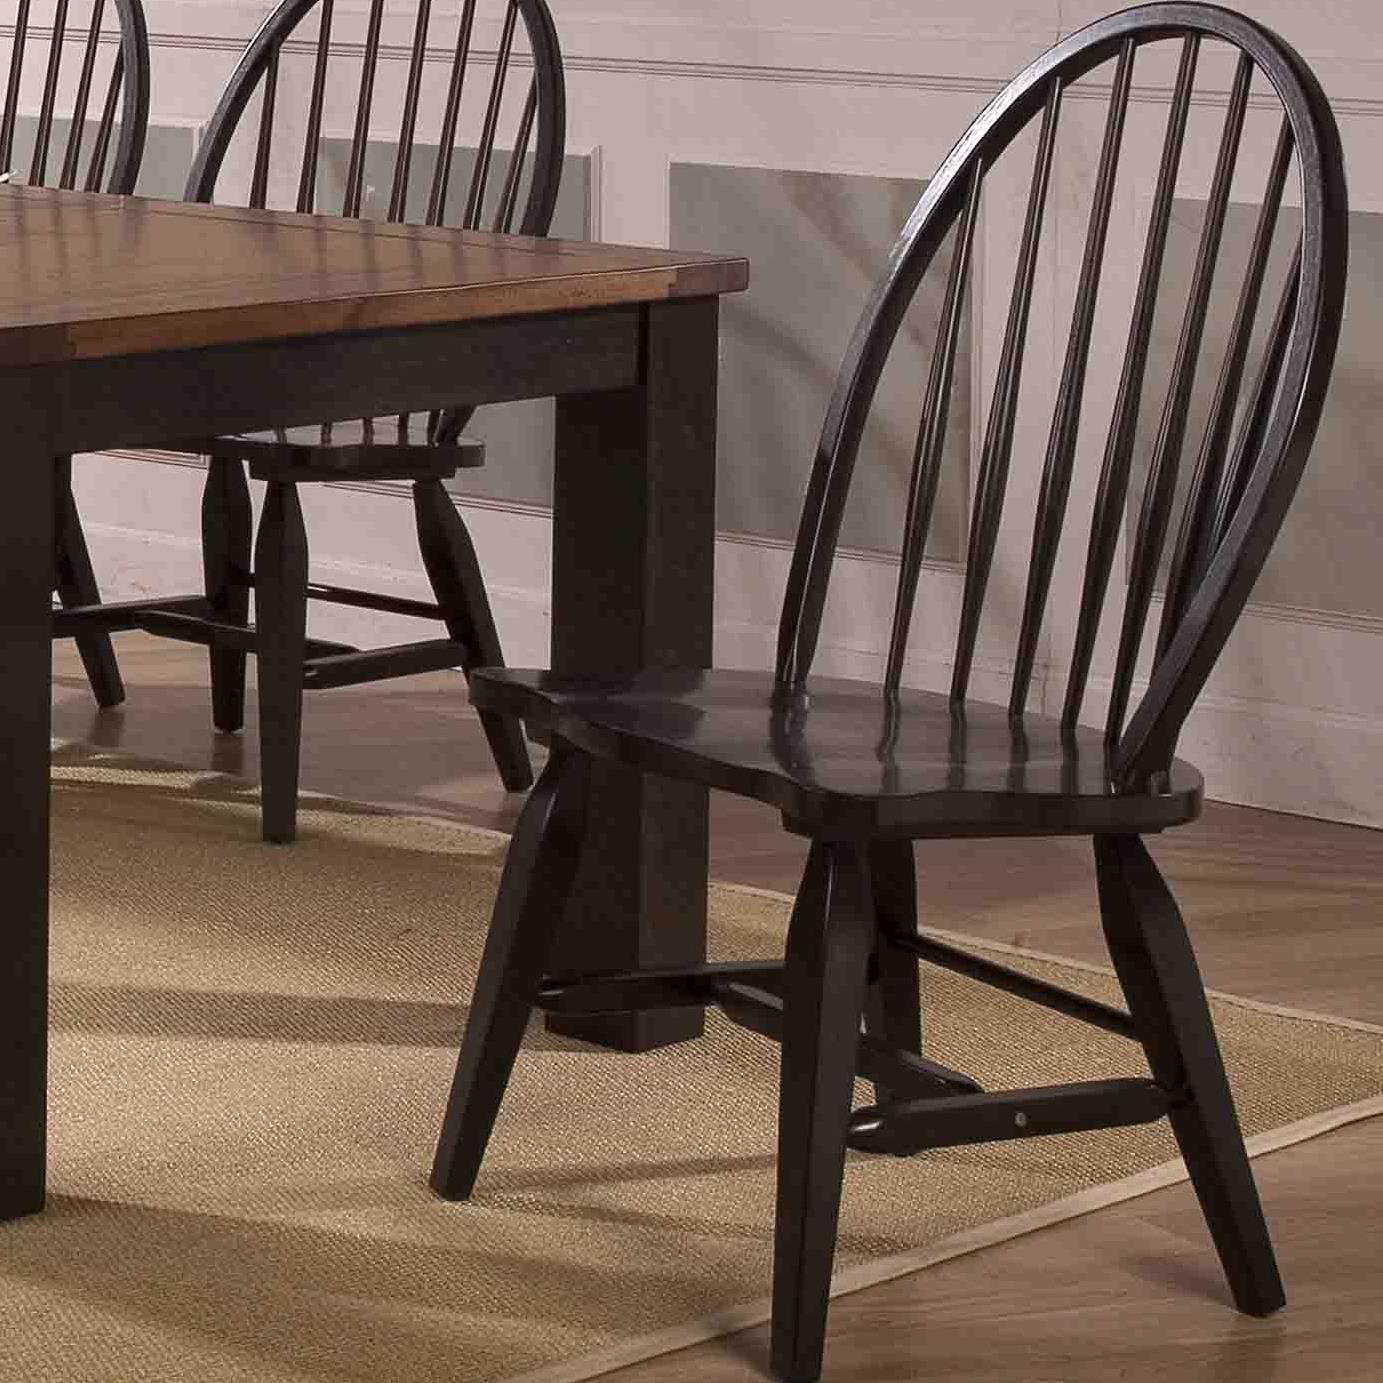 E.C.I. Furniture Acacia Side Chair (KD - 2 Per Carton) - Item Number: 3073-00-S